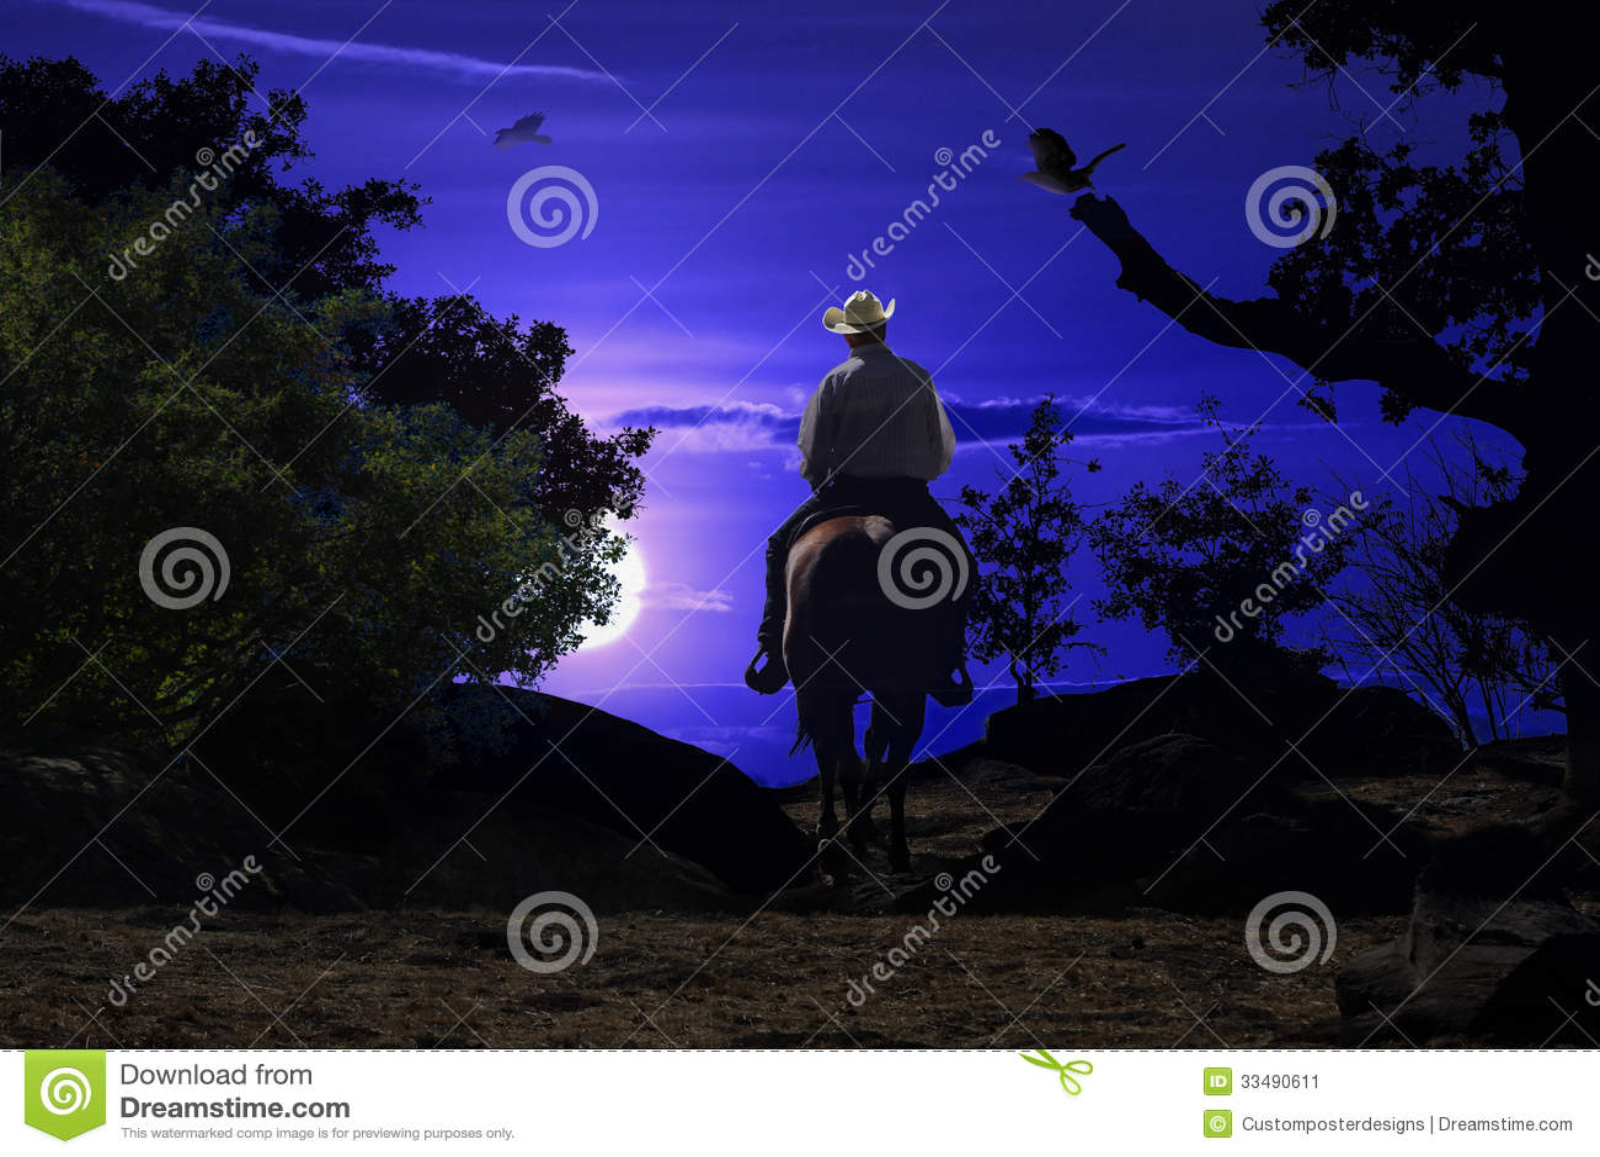 Cowboy riding on a horse VI.